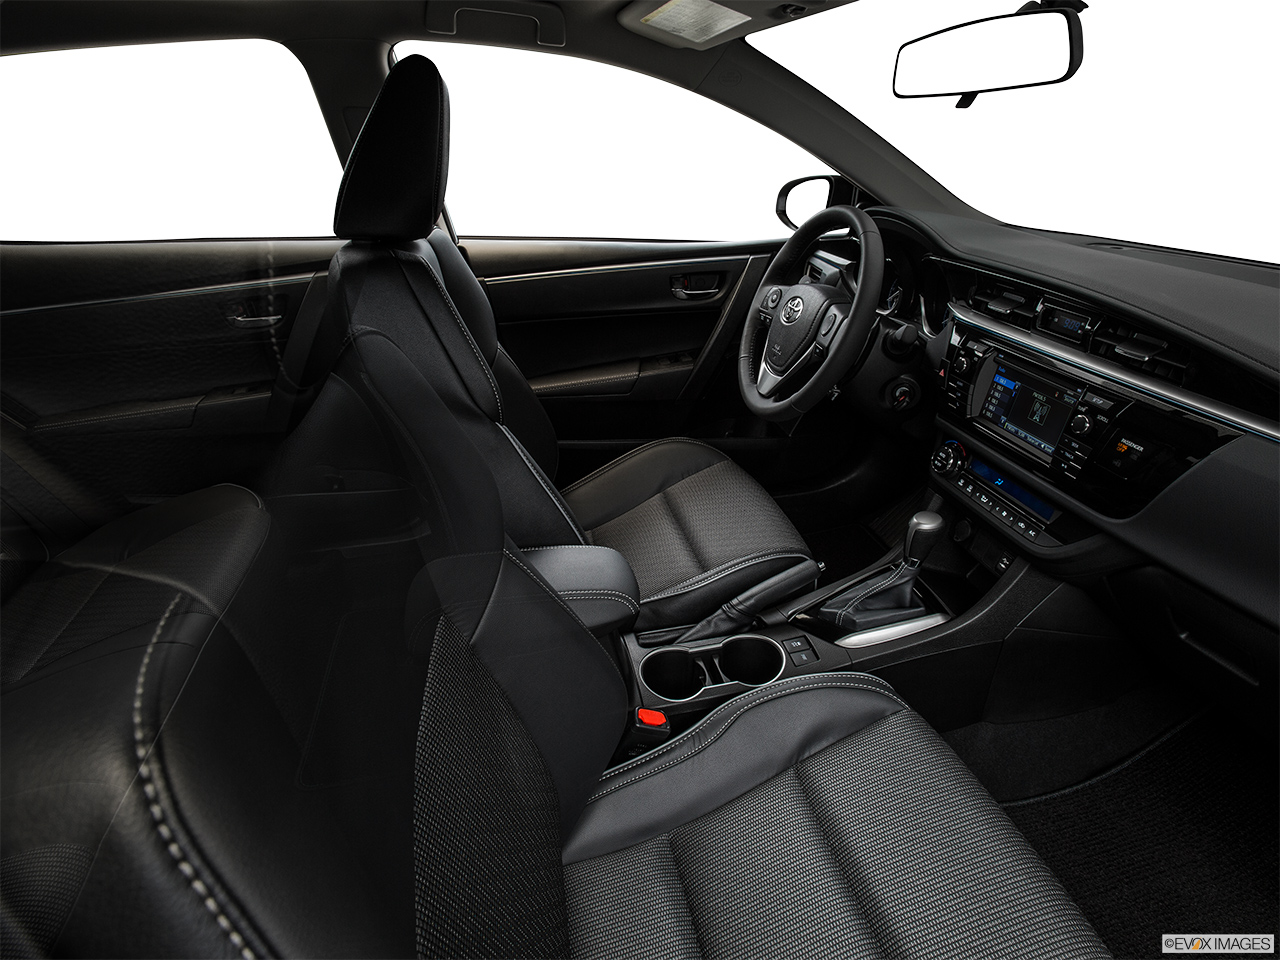 2015 Toyota Corolla 4dr Sedan Manual S Plus - Fake Buck Shot - Interior  from Passenger